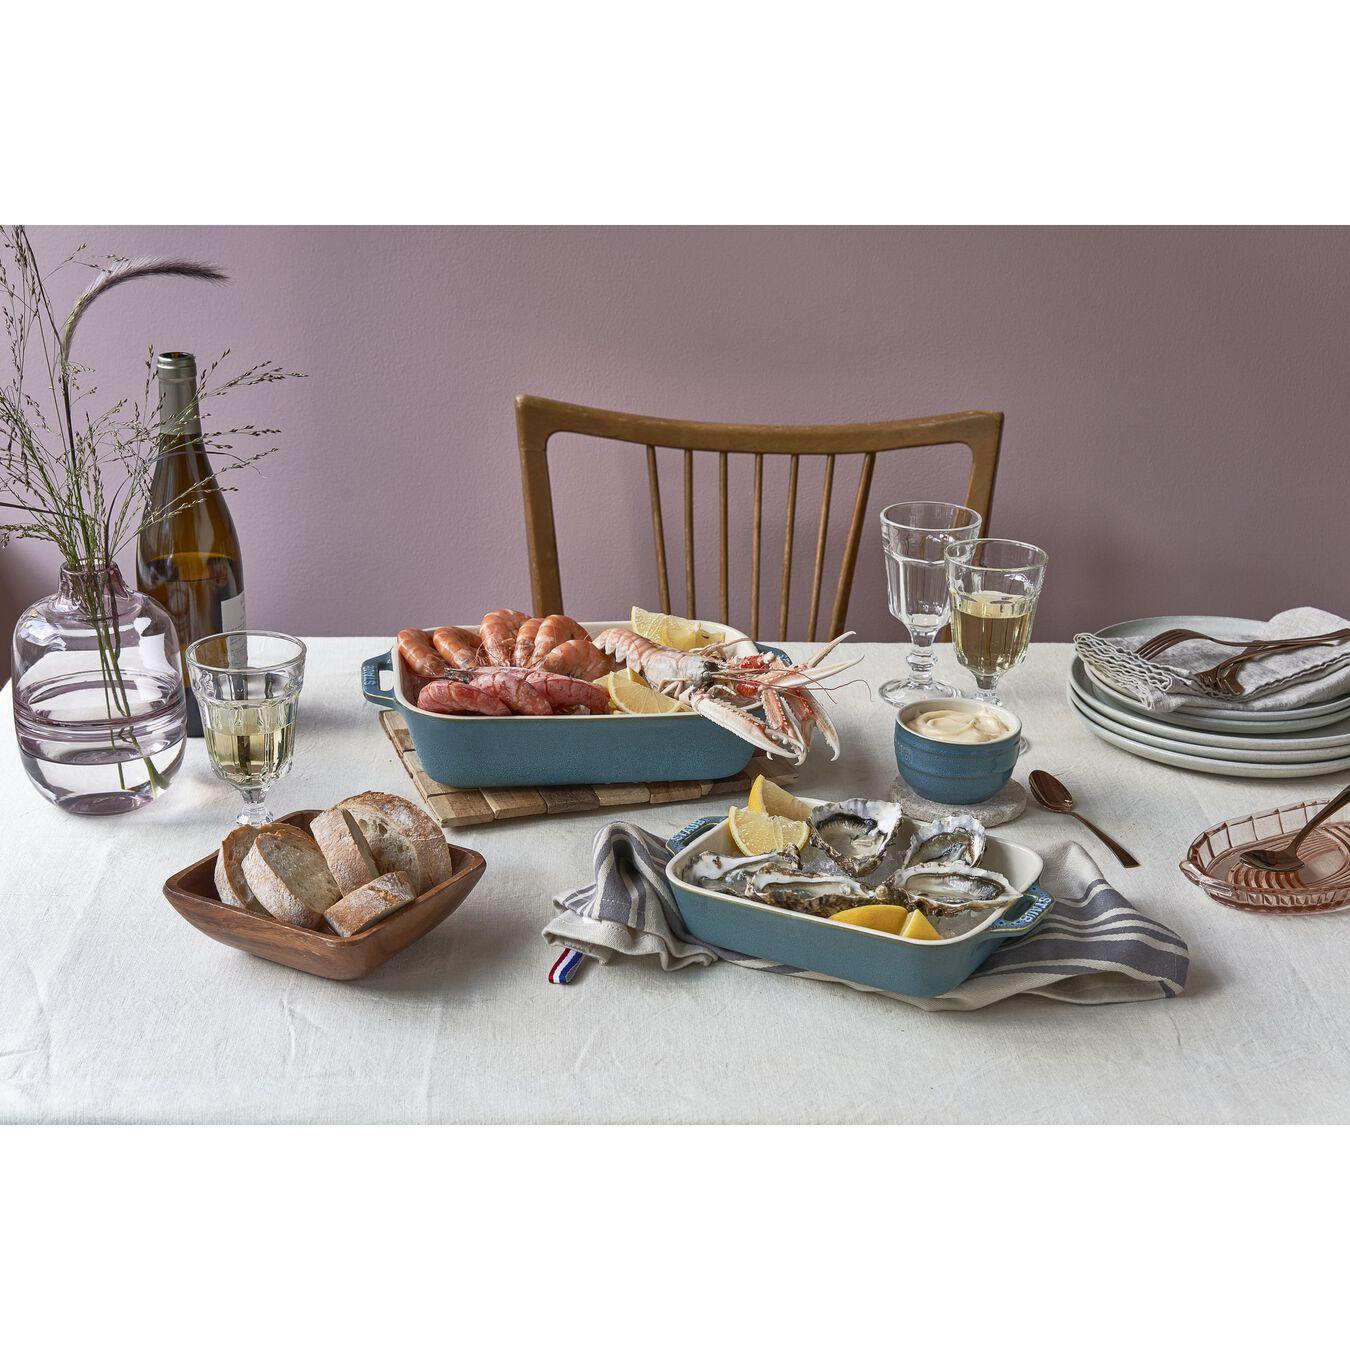 10.5-inch x 7.5-inch Rectangular Baking Dish - Rustic Turquoise,,large 4